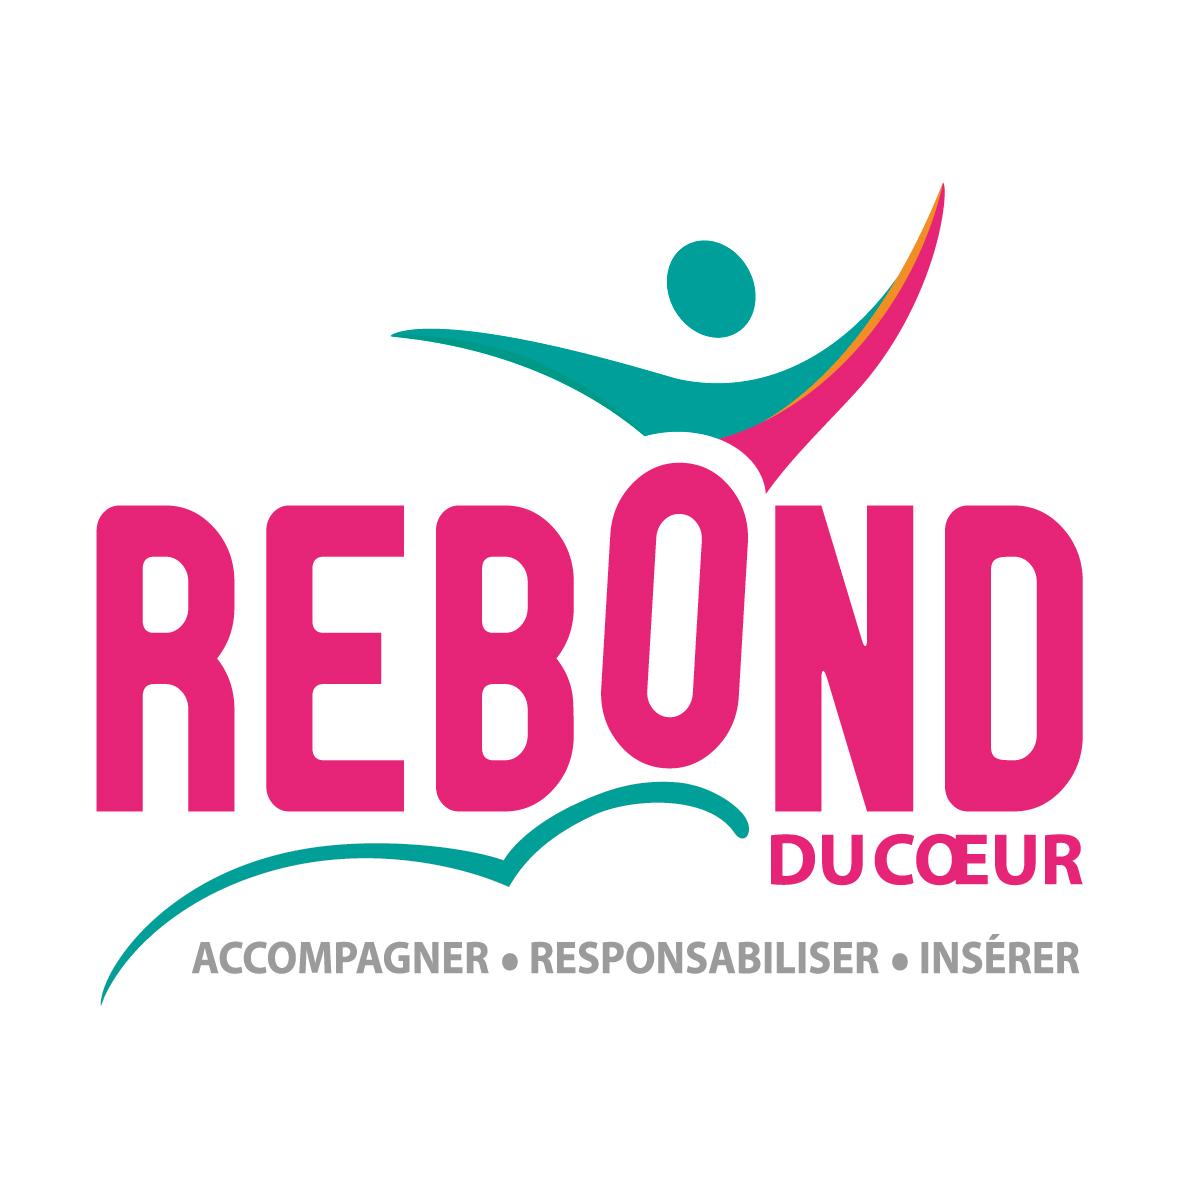 REBOND DU CŒUR